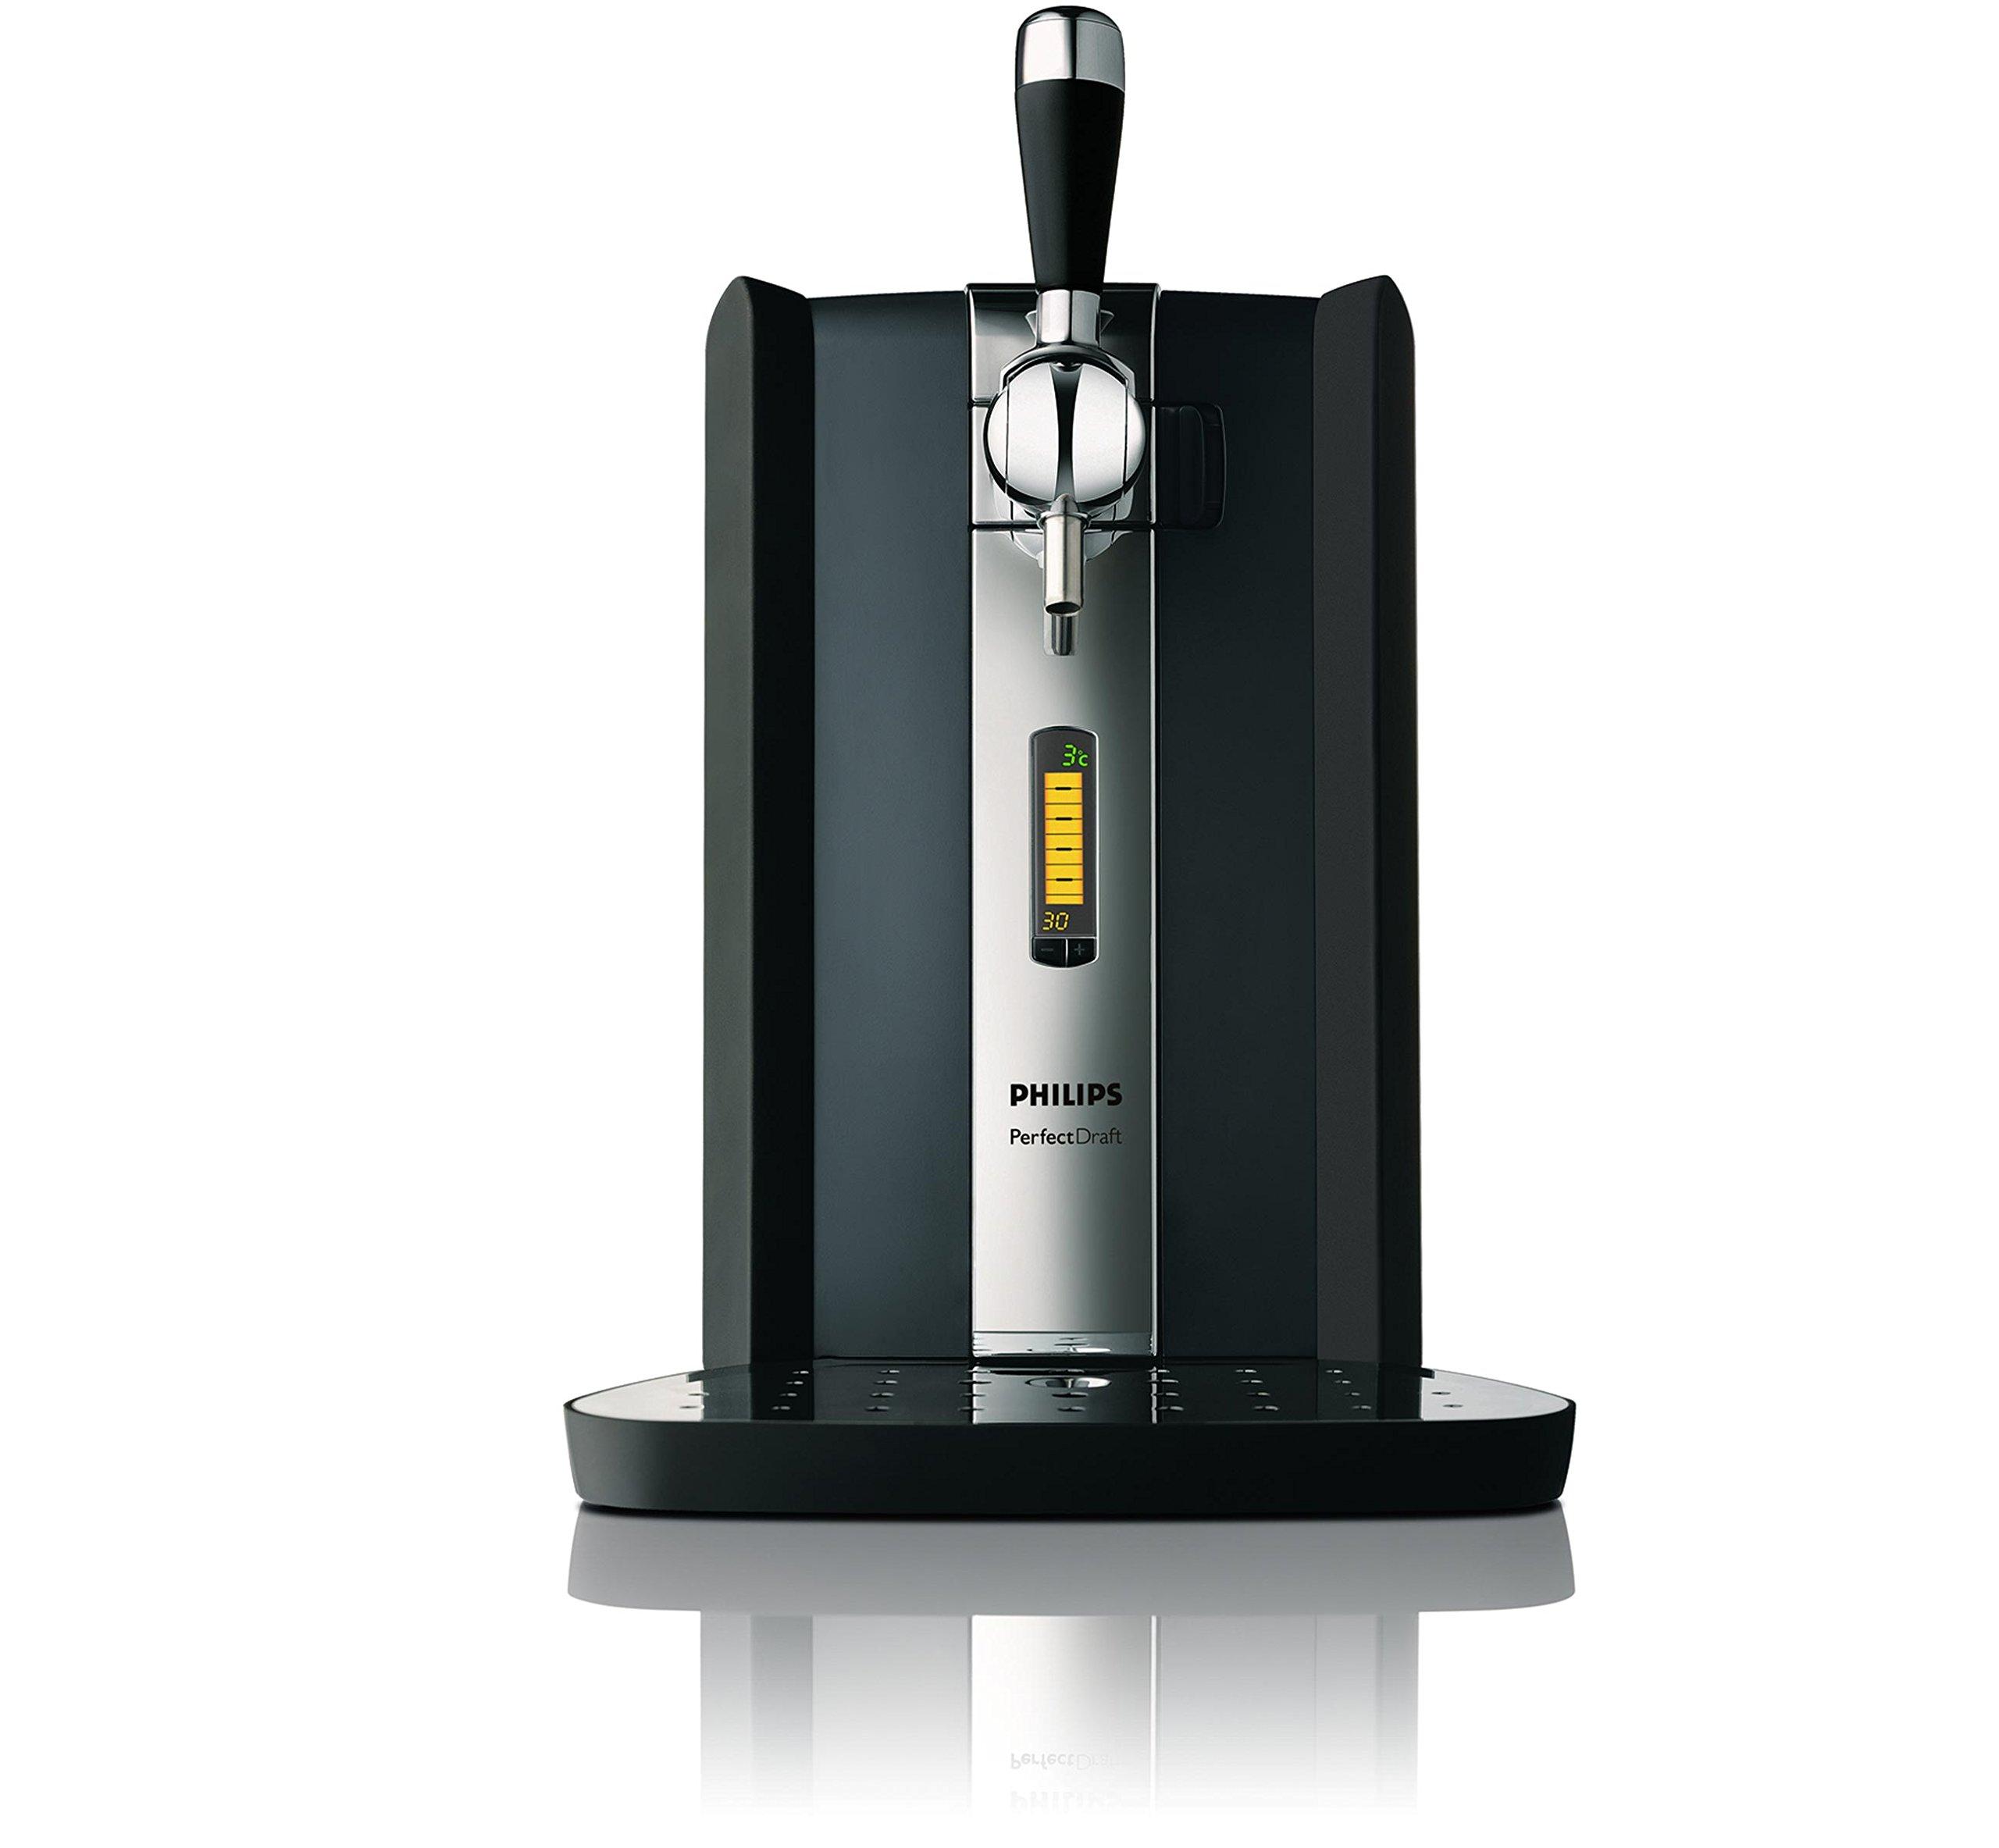 Philips HD3620/25 - Grifo de cerveza para barril de varias marcas, enfria a